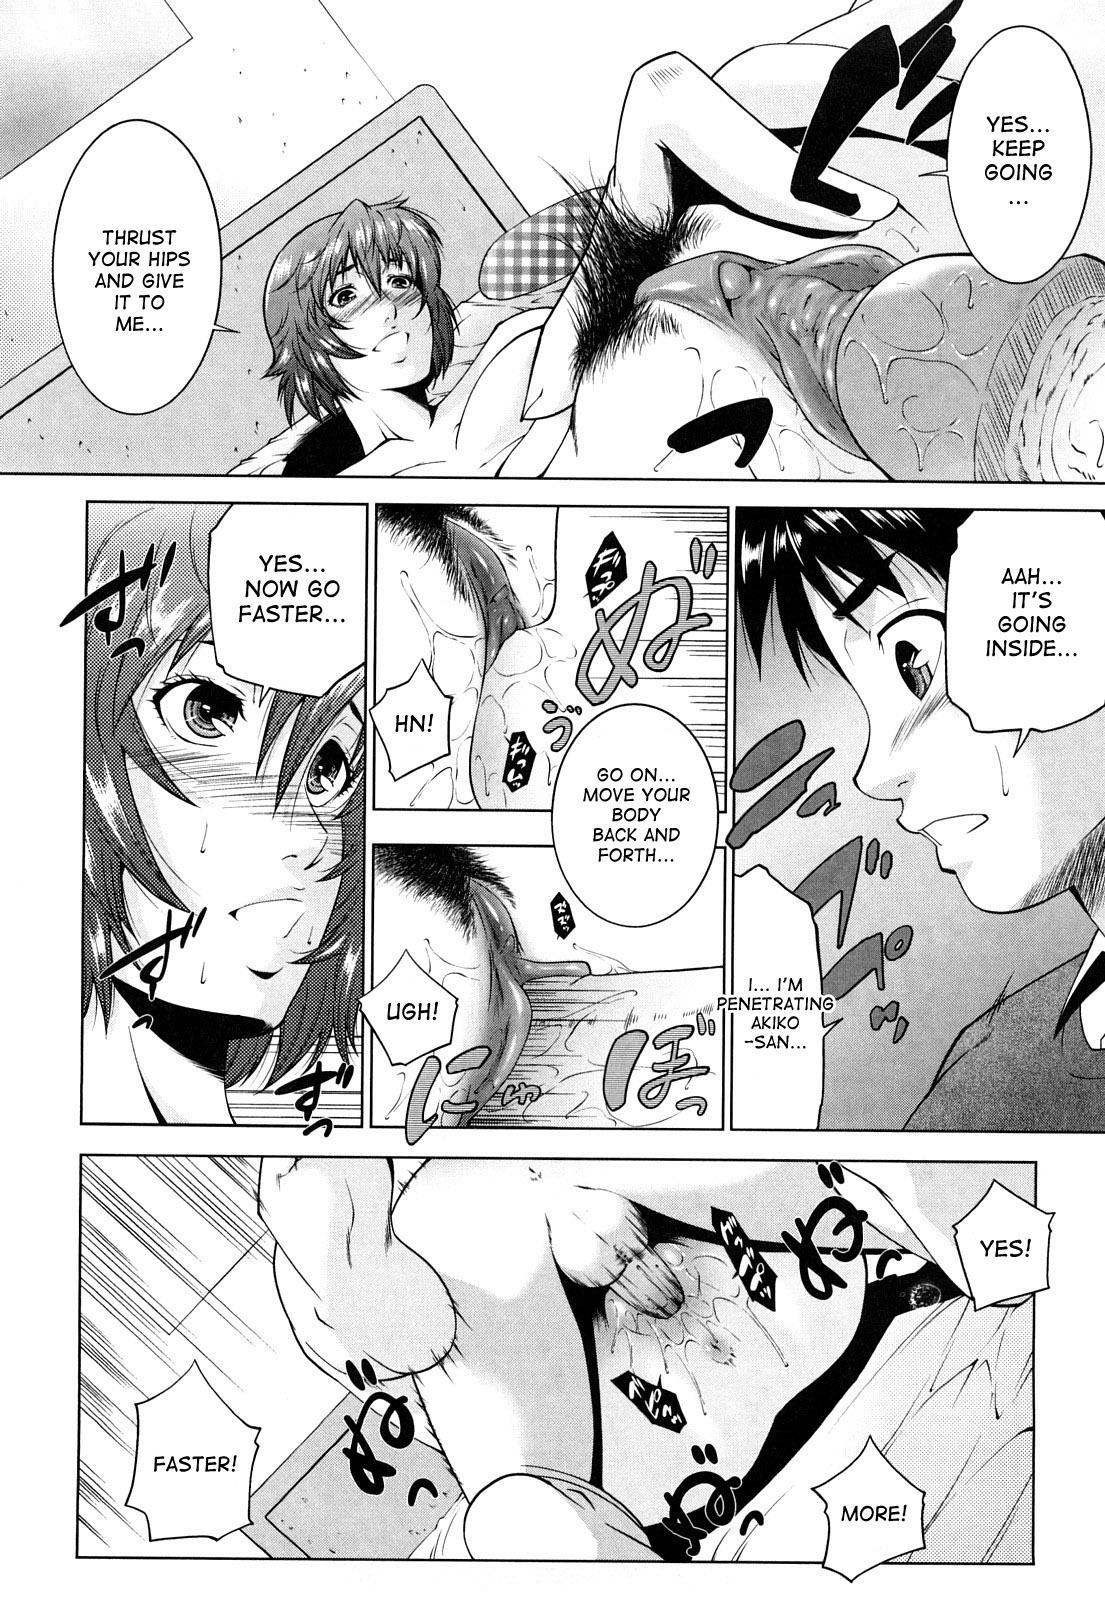 [Touma Itsuki] Ane-sama Inkou - Sister's Sexy Smell [English] {desudesu} 31